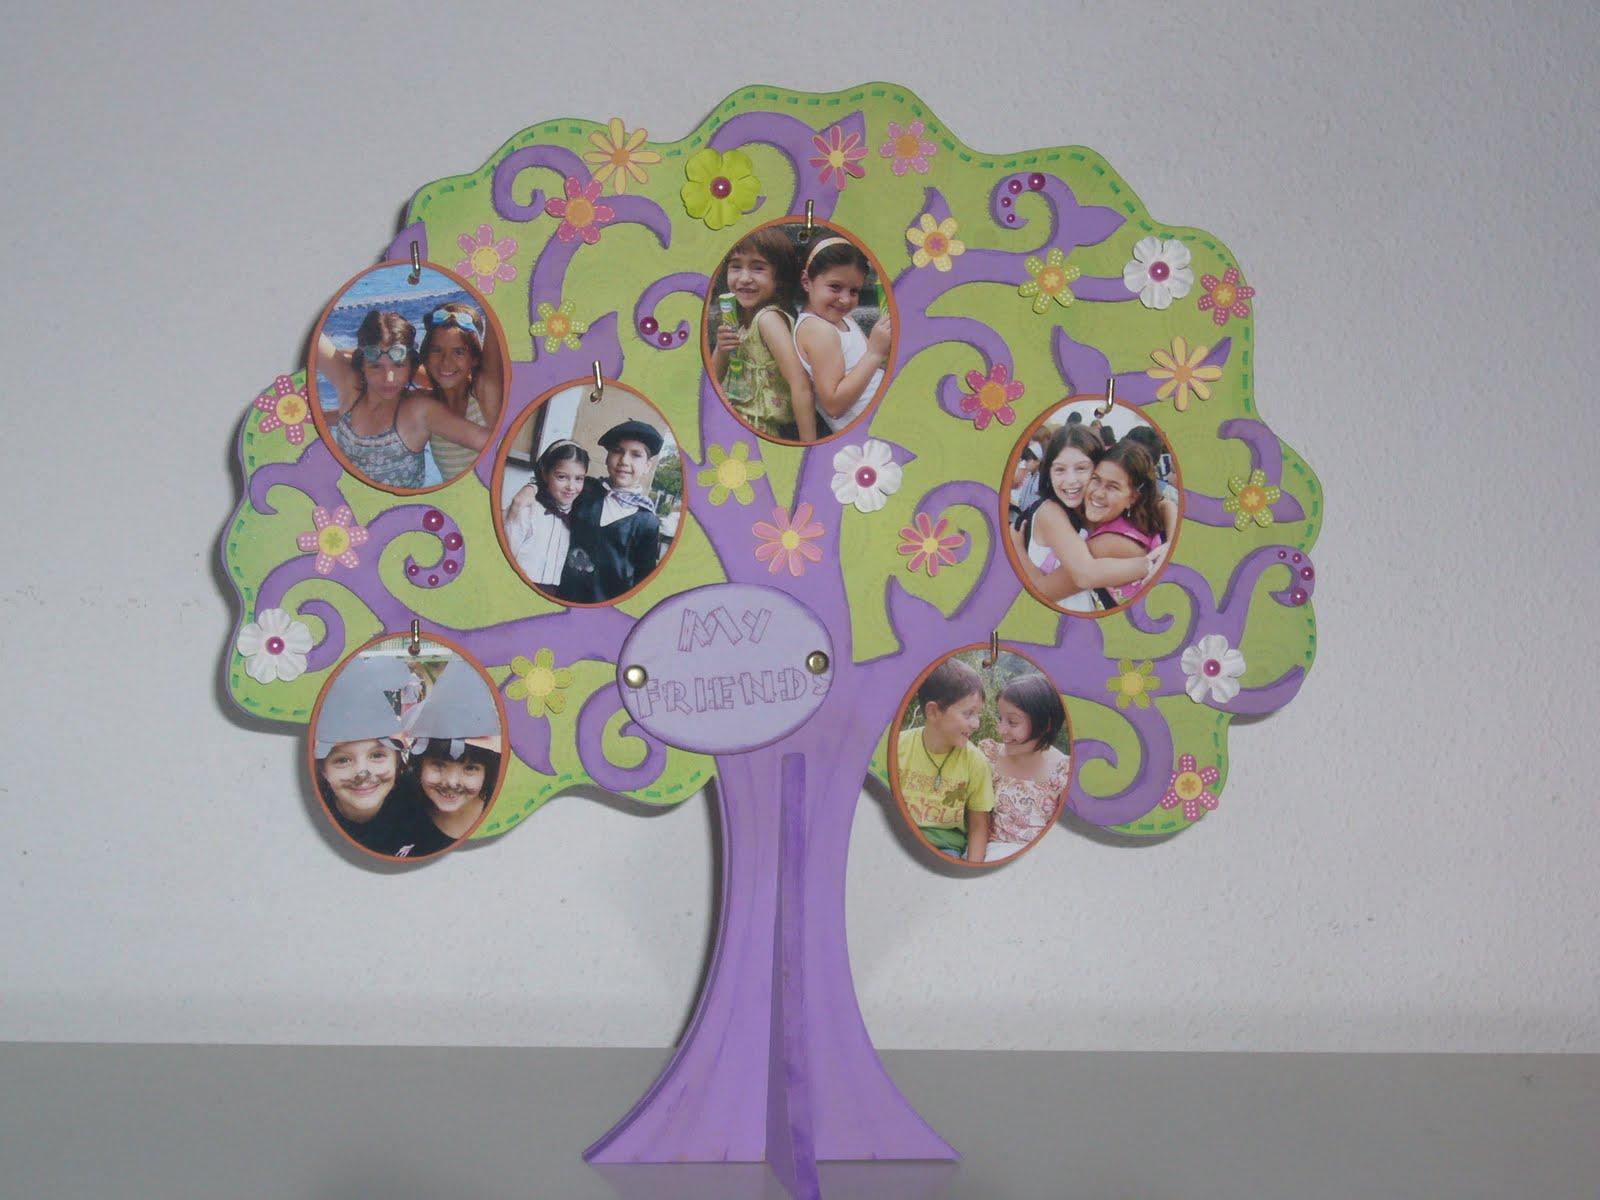 arbolgenealogico creativo arbol genealogico creativo manualidades imagui